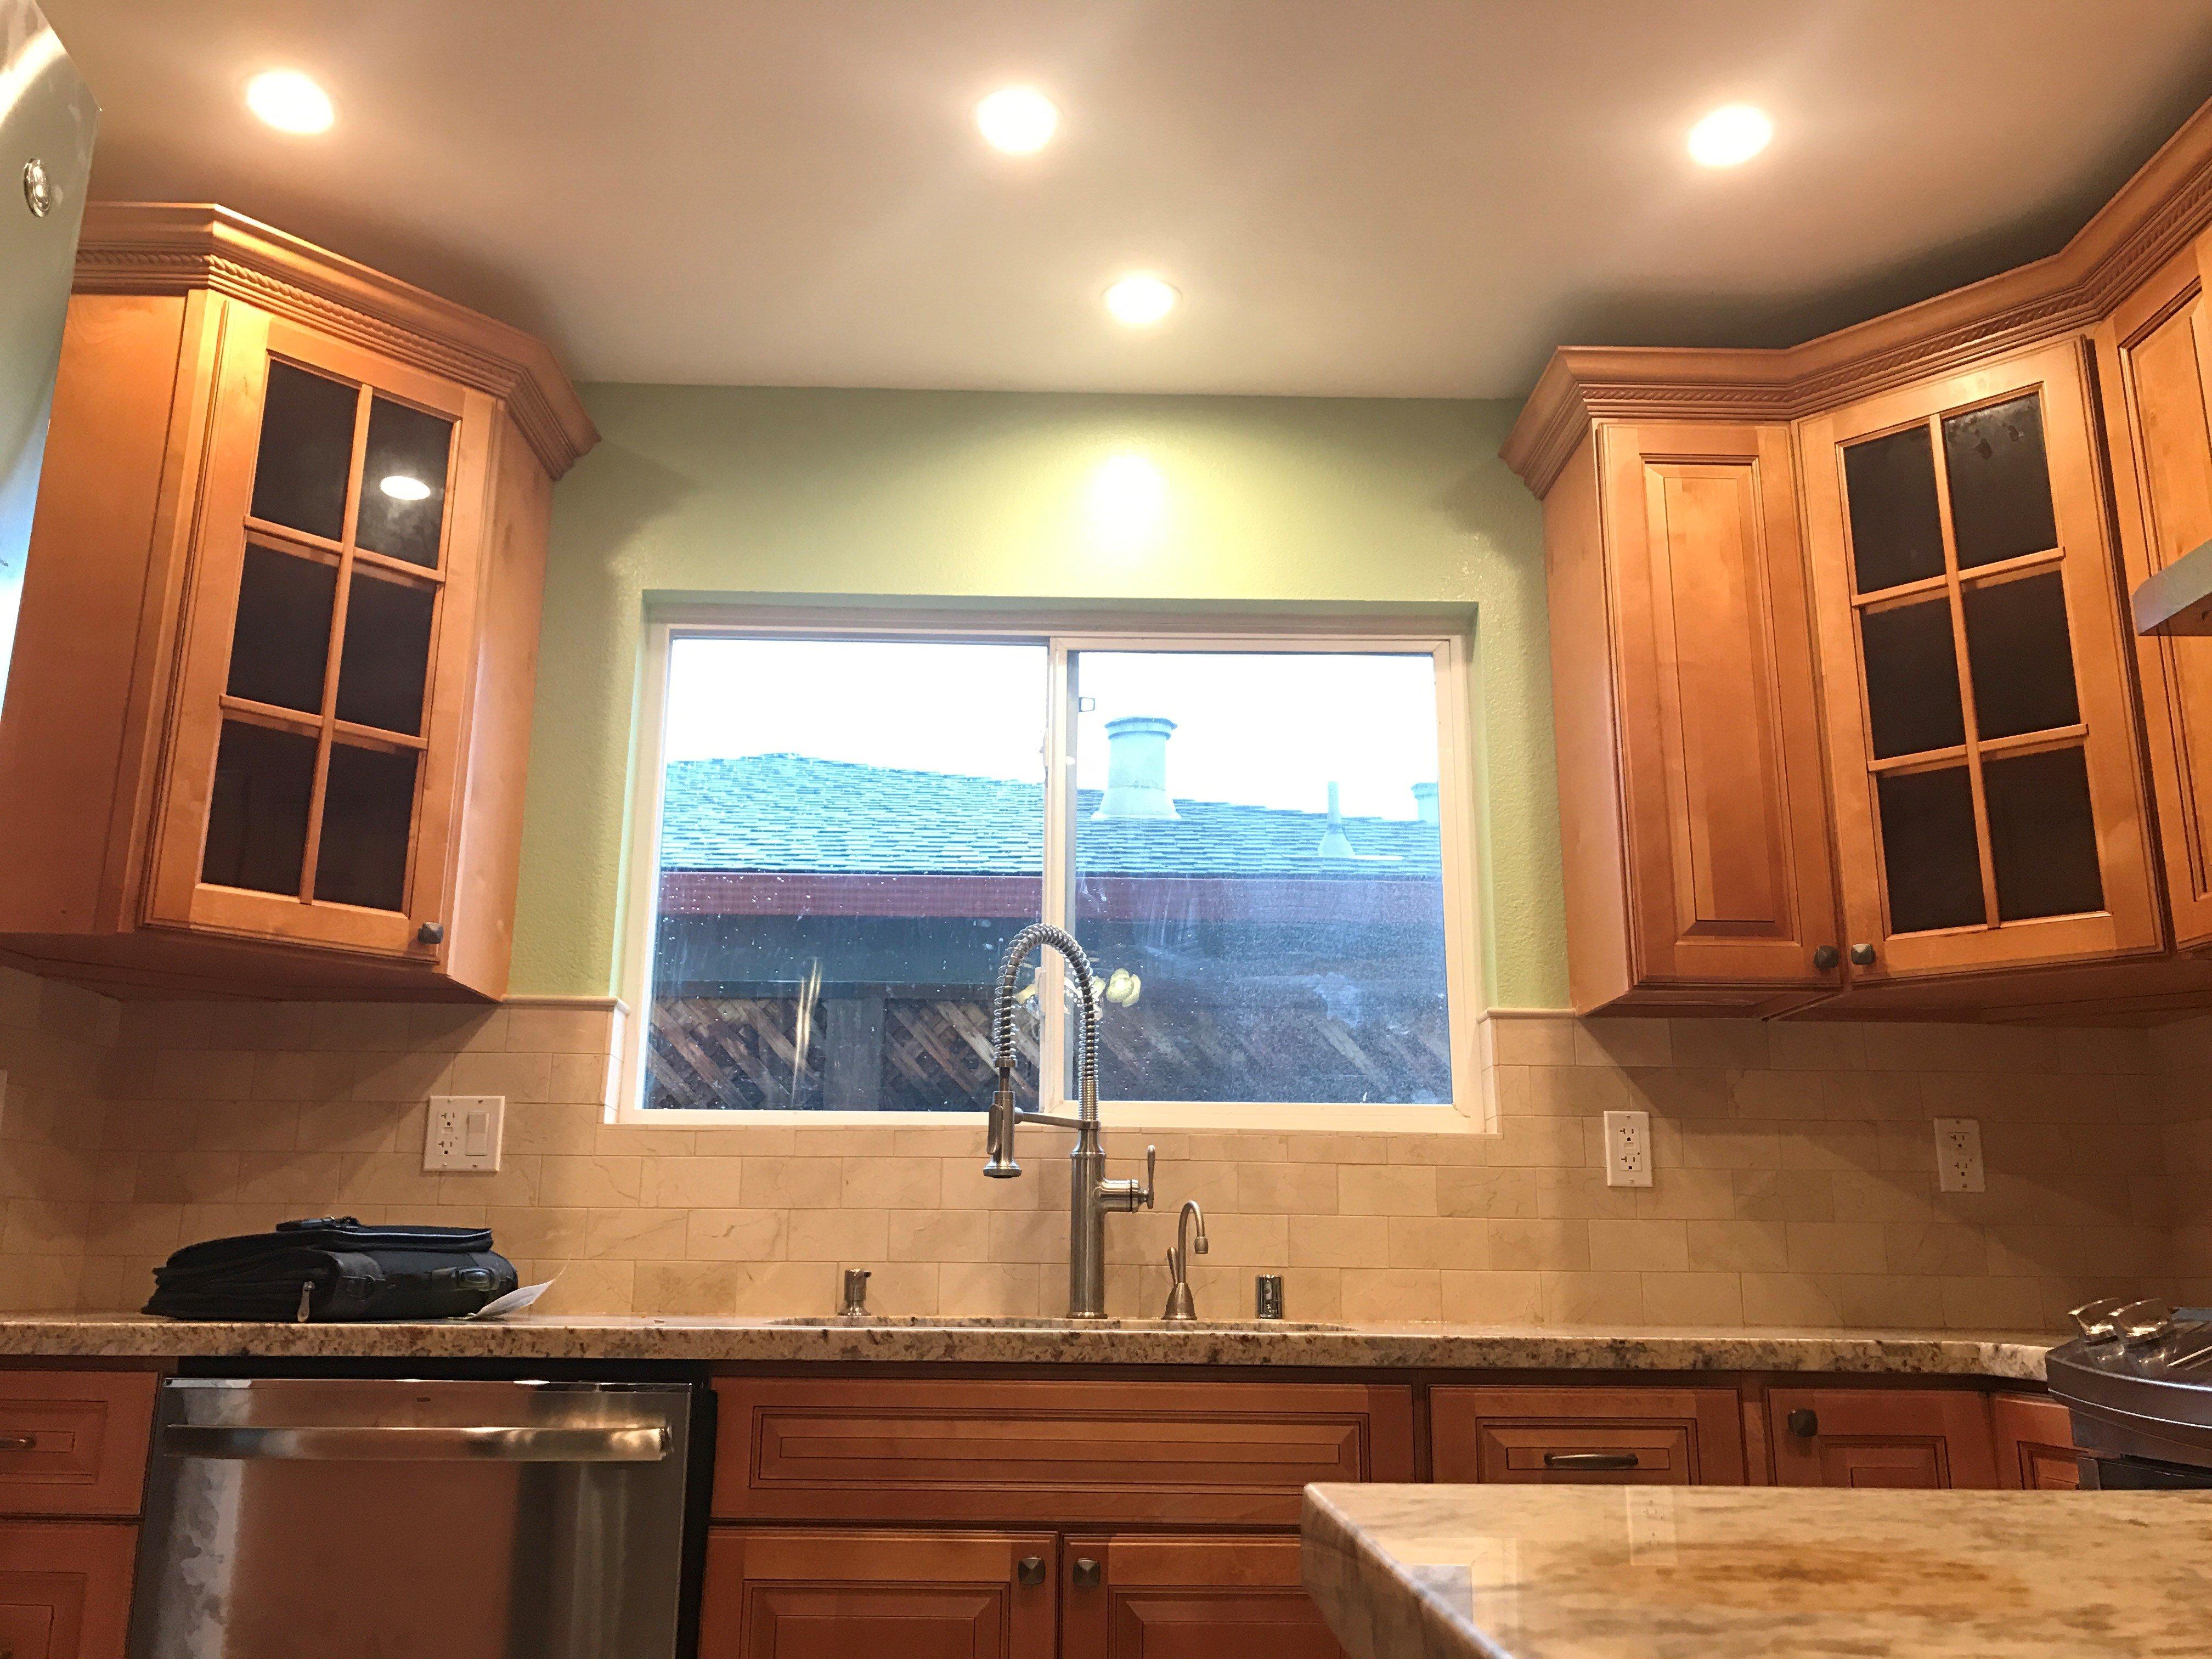 Kitchen Remodeling - San Jose CA, Mountain View CA | Quartz Construction